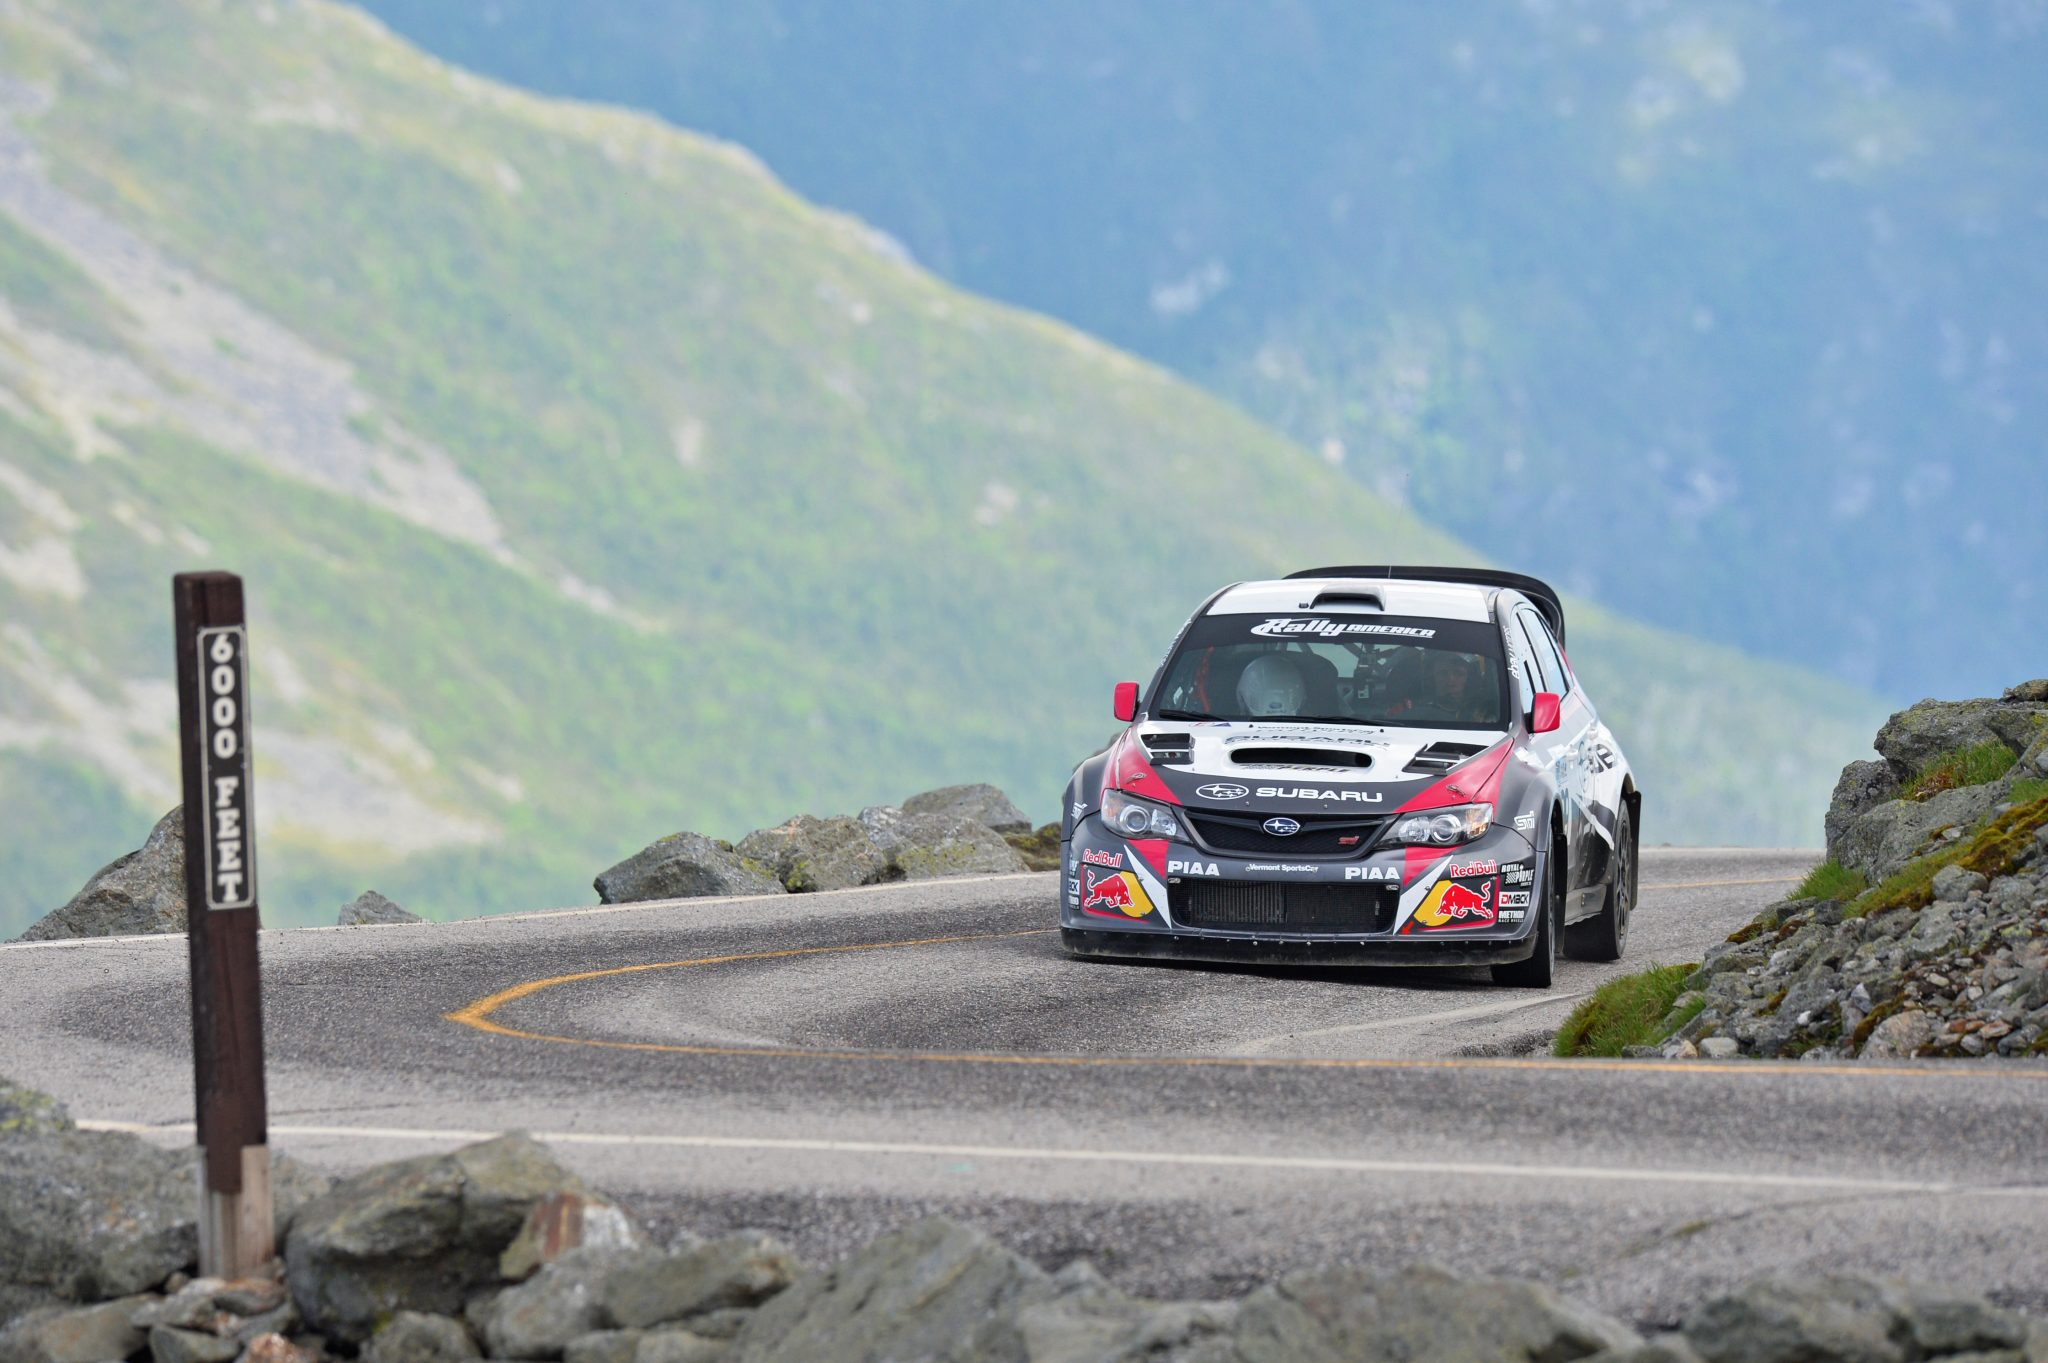 2014 Subaru Mt. Washington Hillclimb